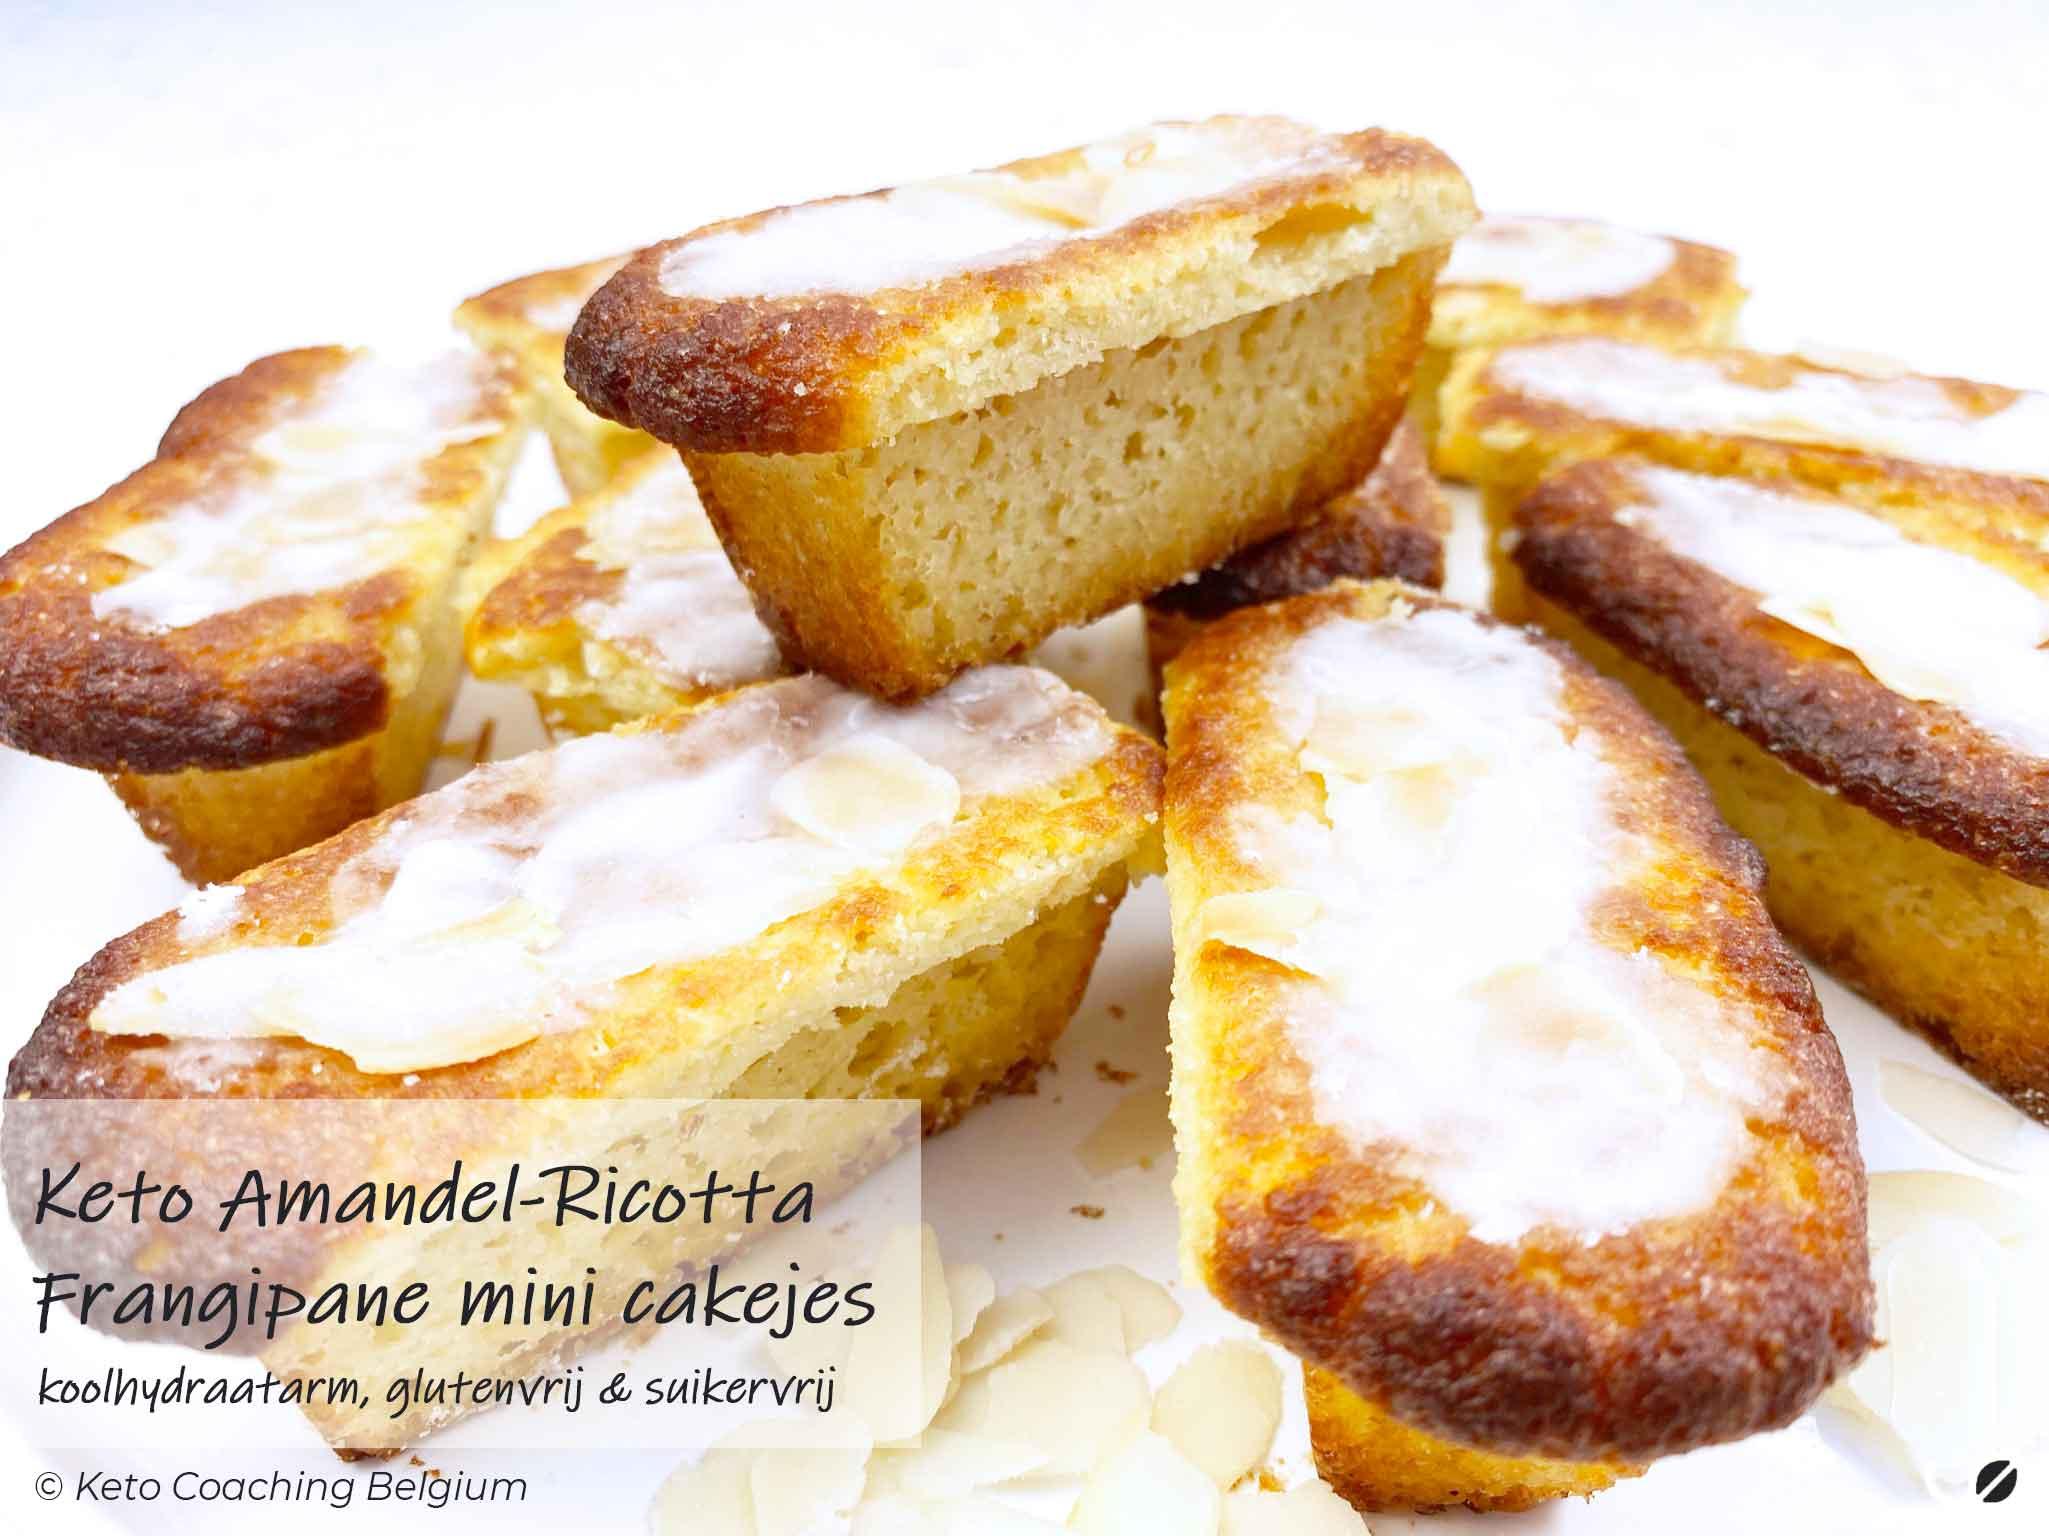 Keto amandel ricotta frangipane mini cakejes koolhydraatarm glutenvrij suikervrij recept